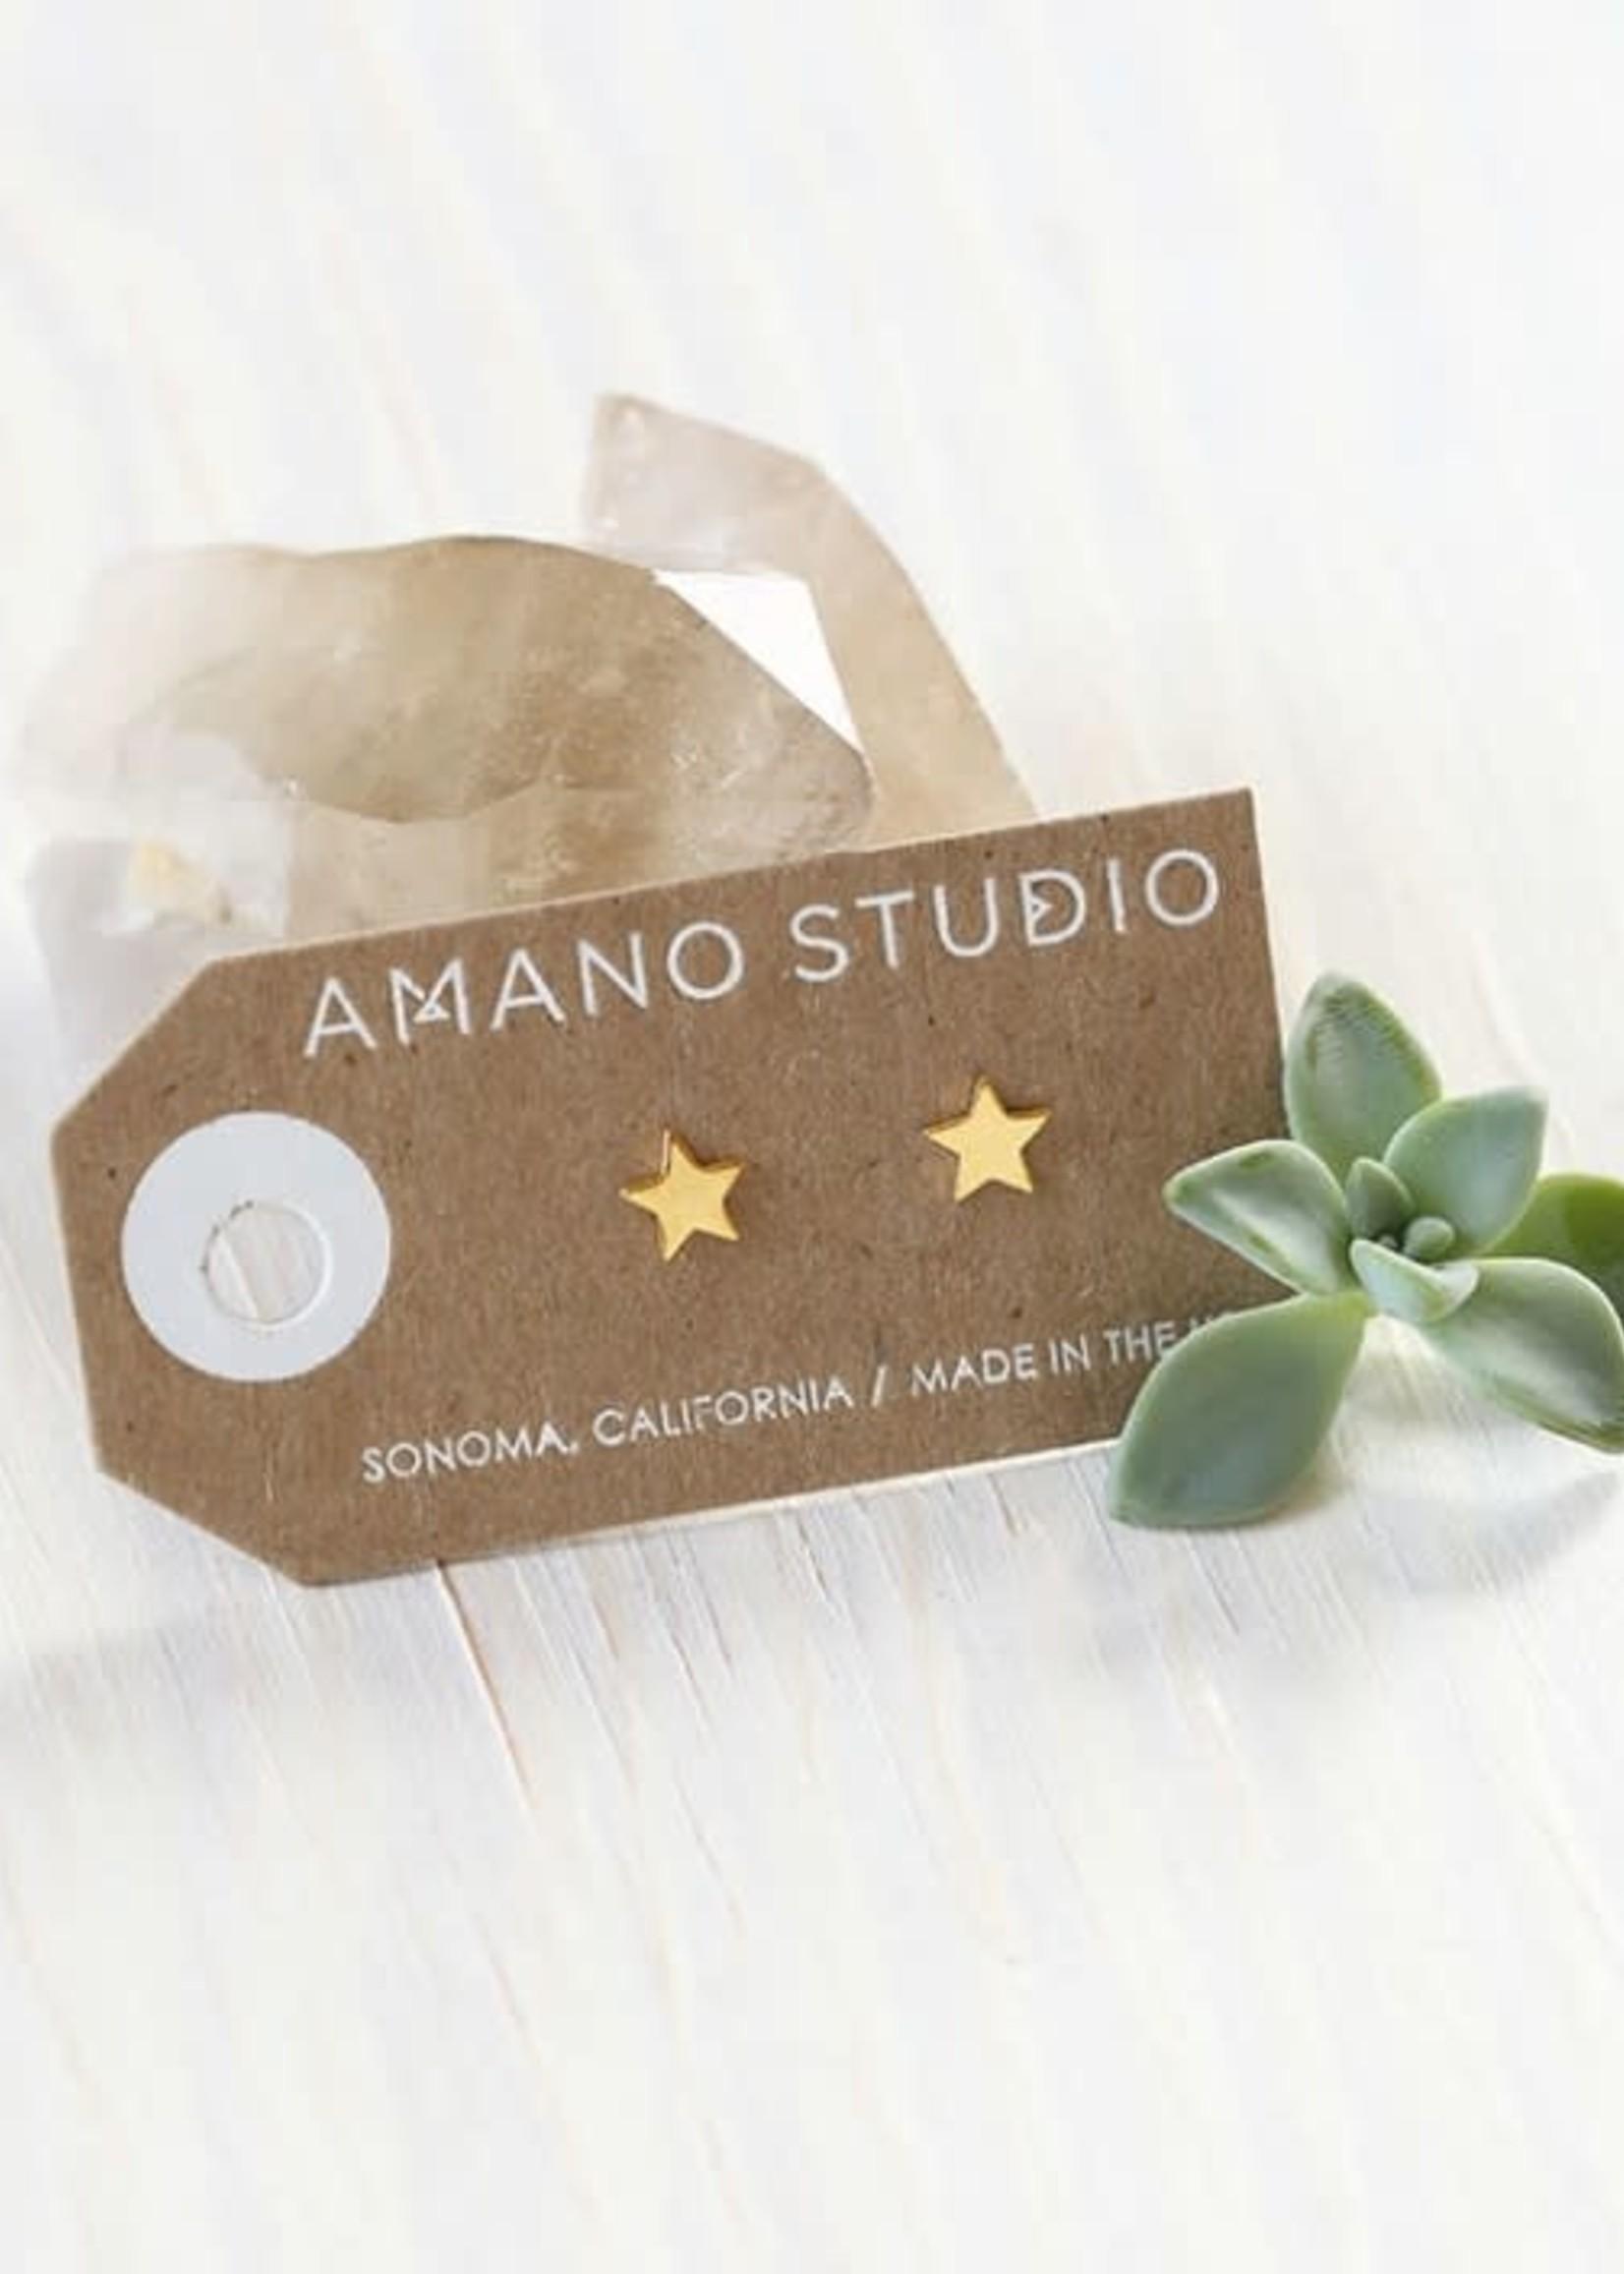 AMANO studio STAR Stud, 24K gold plated